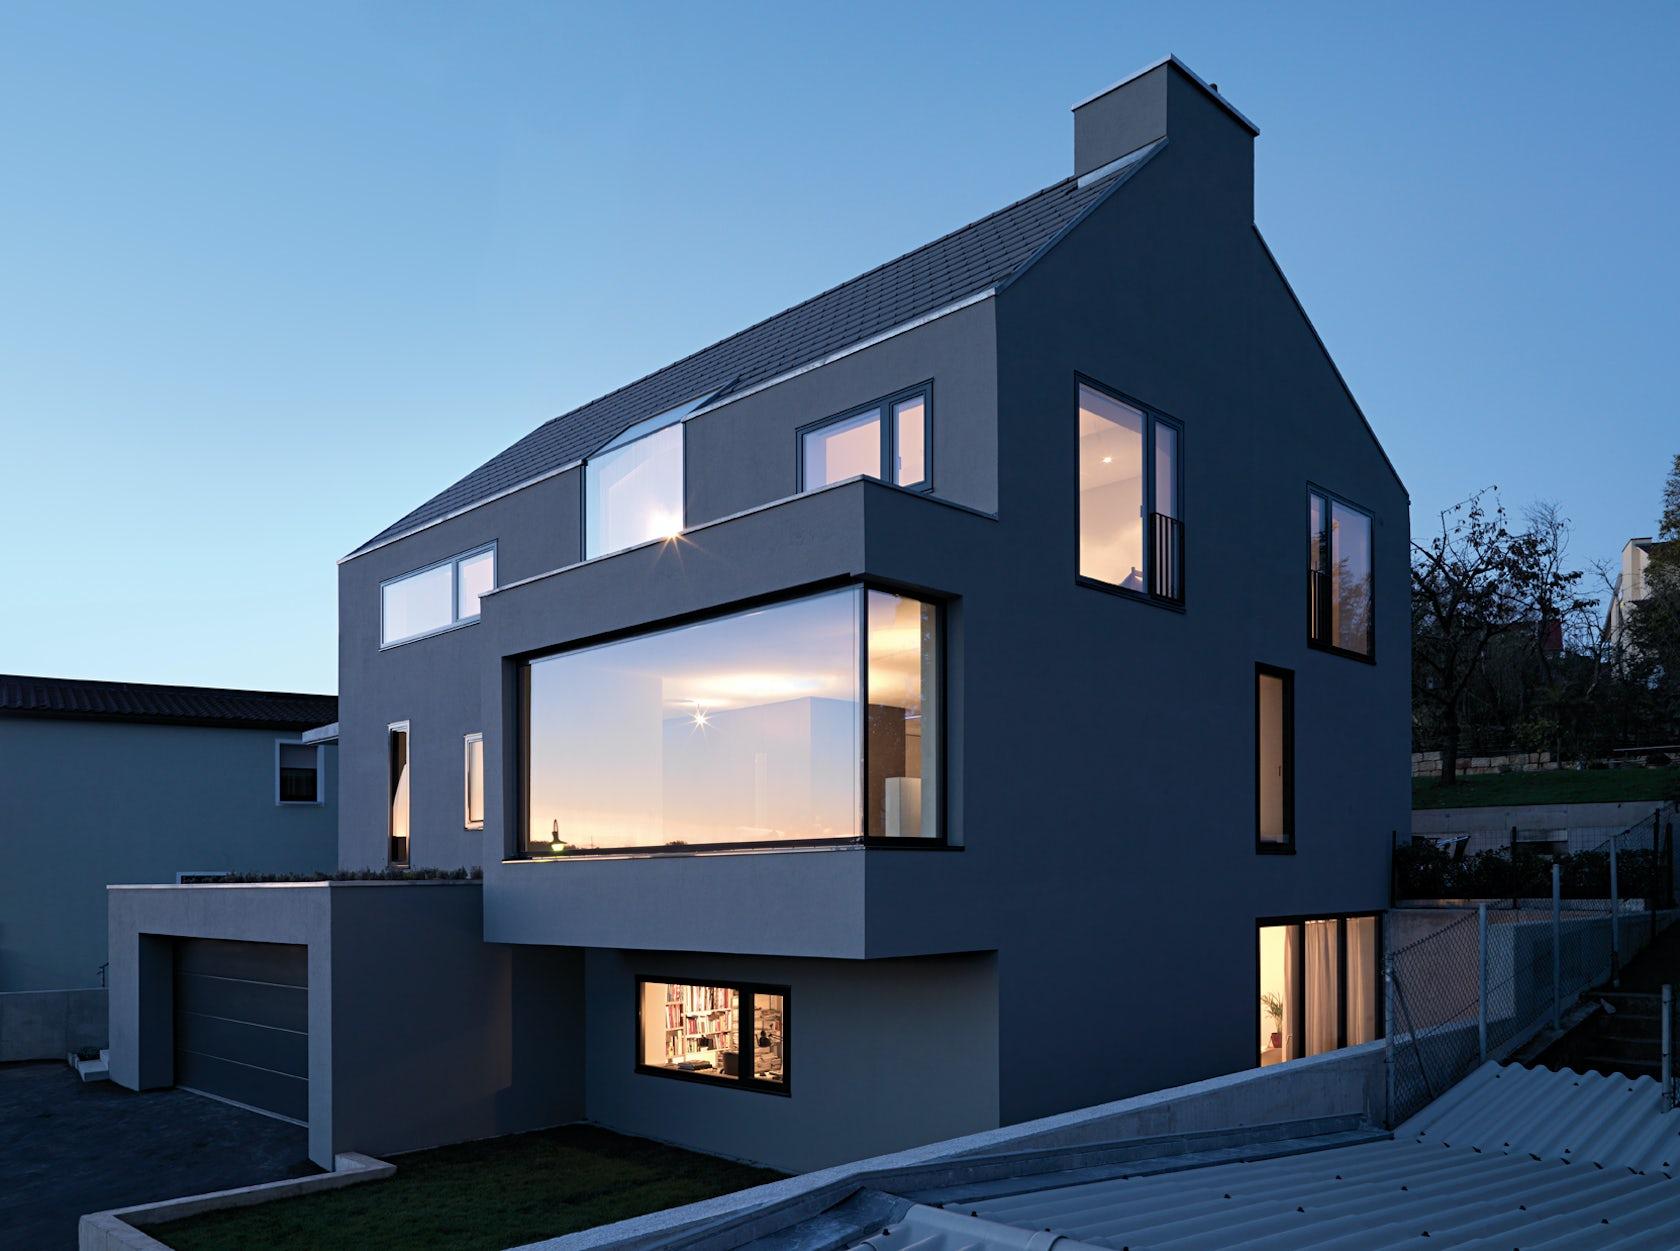 Ippolito Fleitz Group - Identity Architects on Architizer